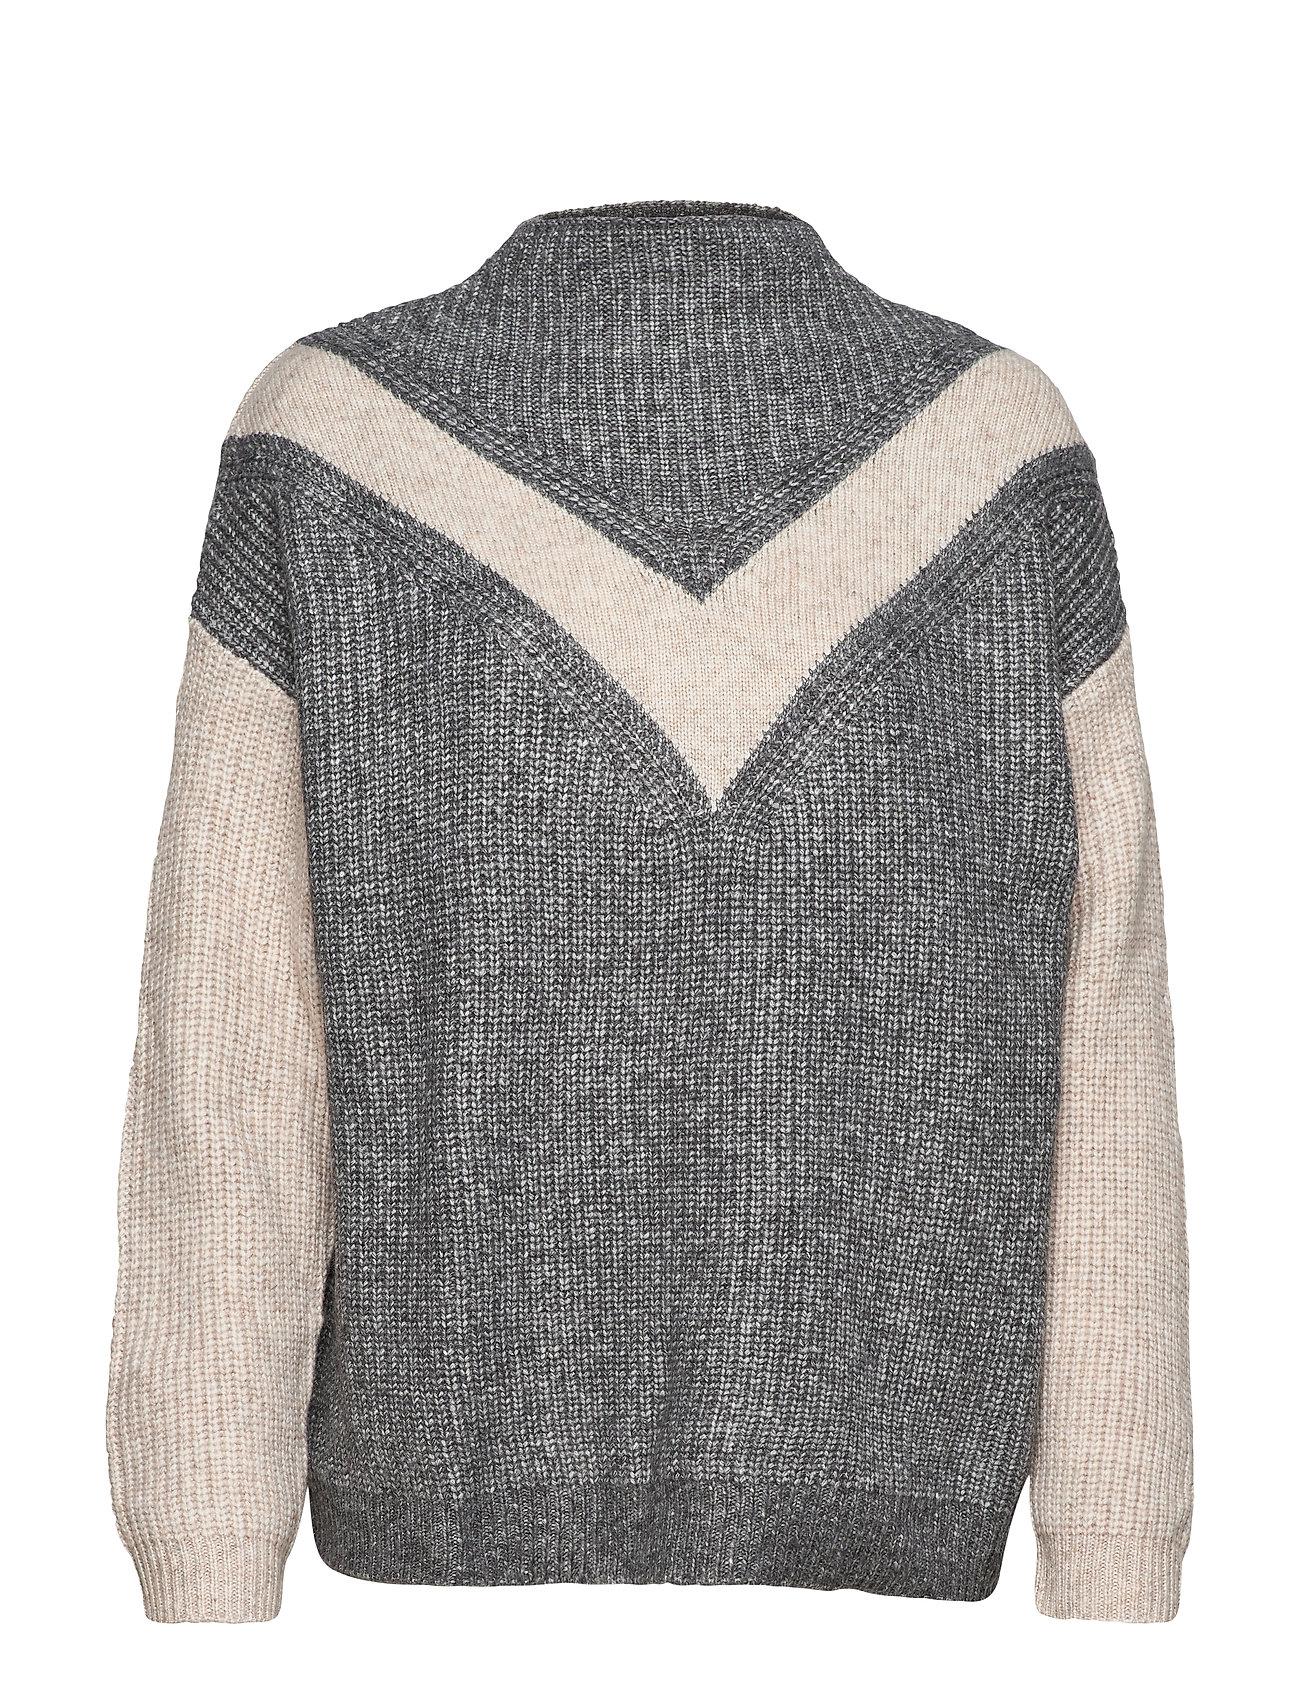 Mango Bow flecked sweater - GREY